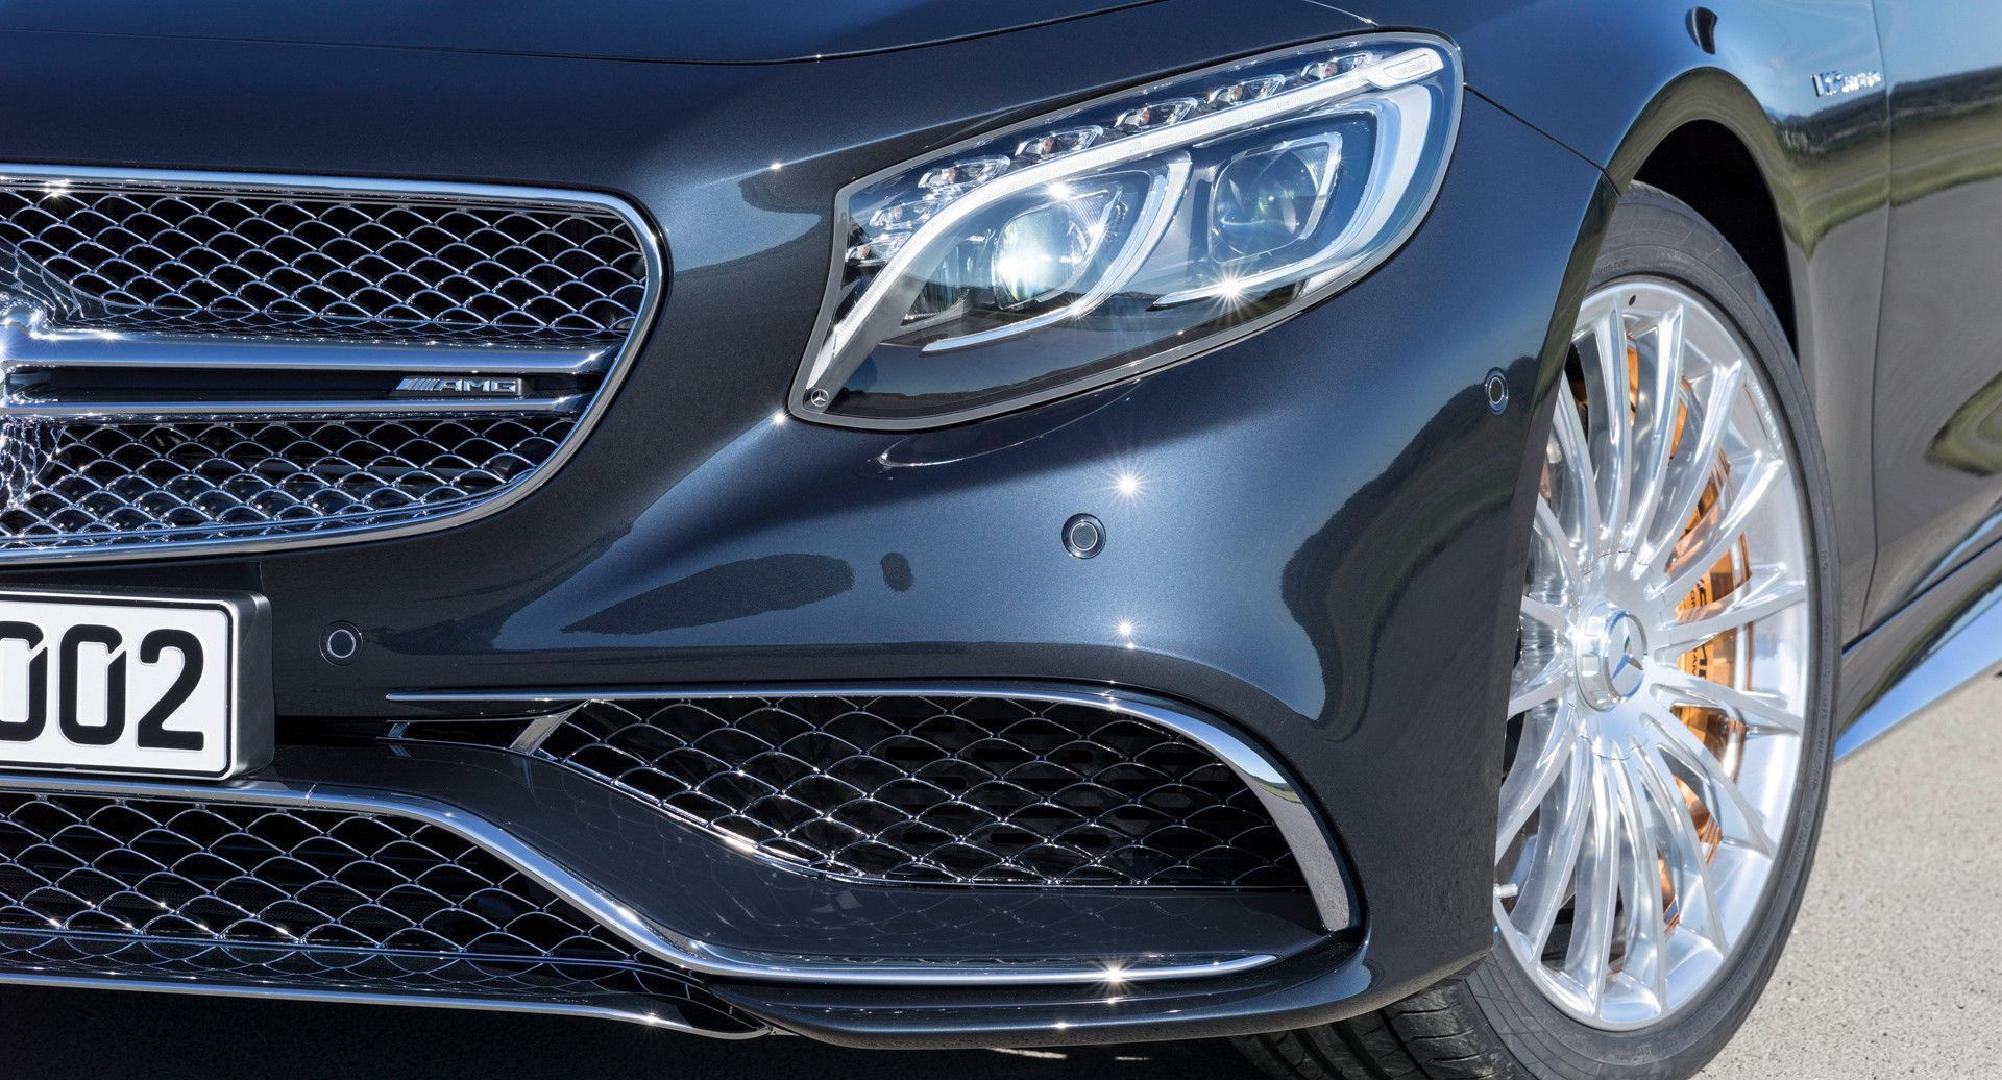 Mercedes Benz S65 Amg Widescreen